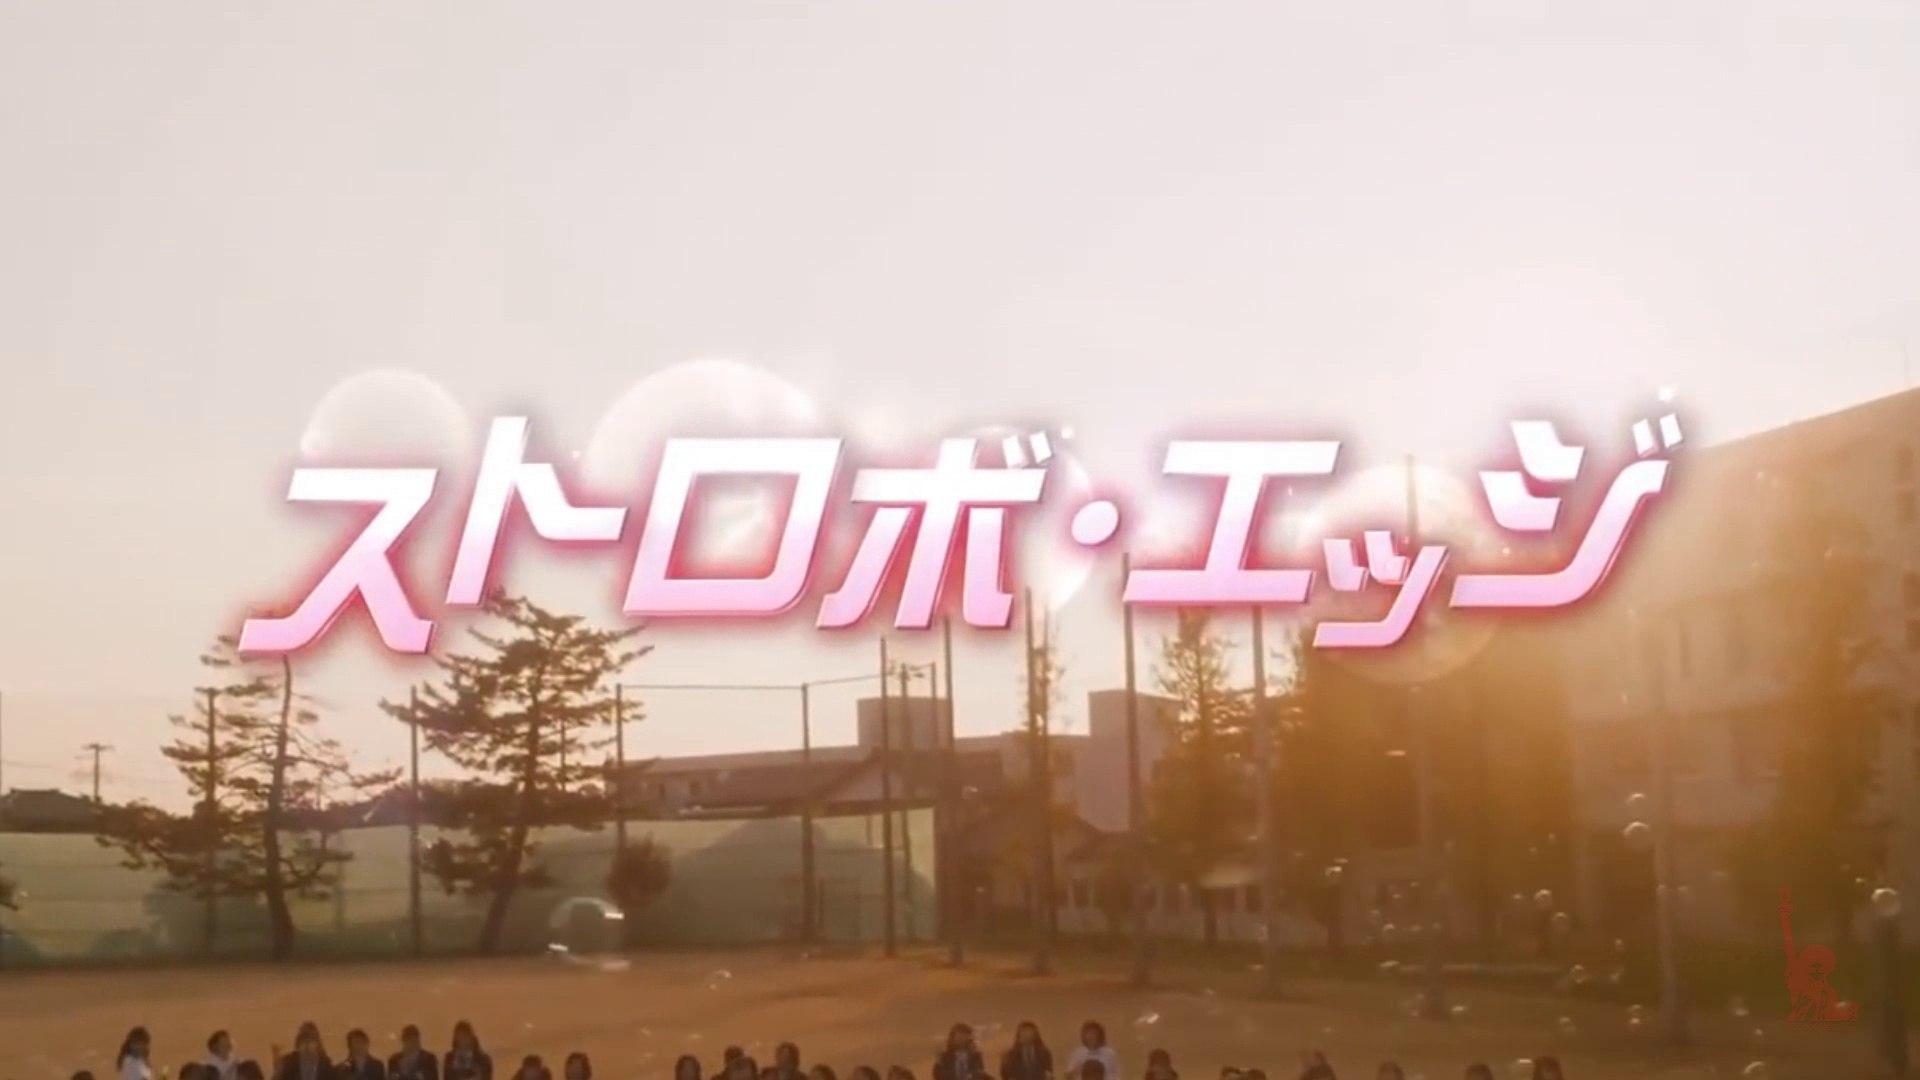 Sutorobo Ejji 2015 Trailer Vo Japan Video Dailymotion